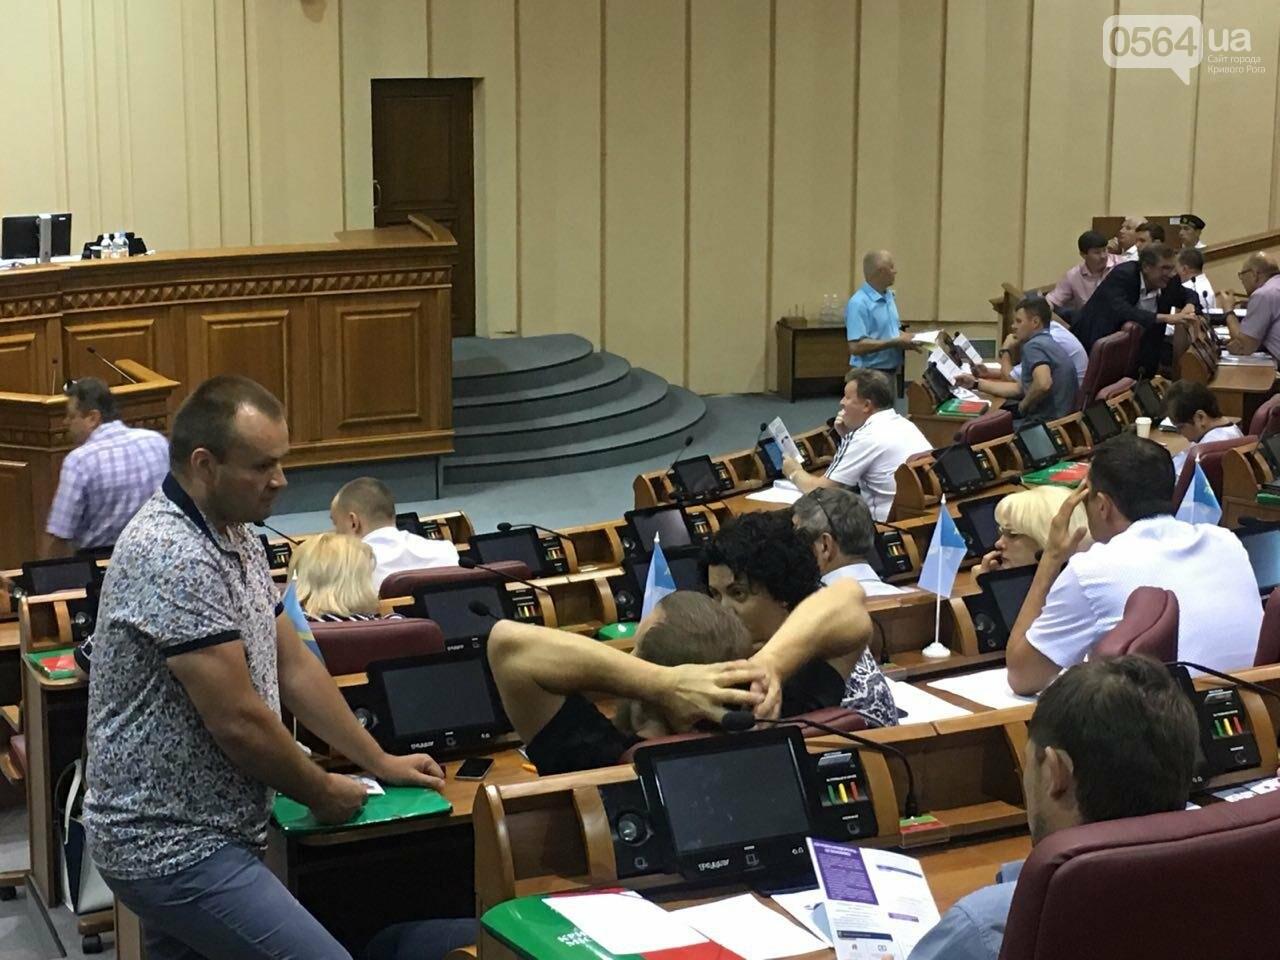 Криворожский горсовет не поддержал петицию о запрете Марша равенства, - ФОТО, фото-11